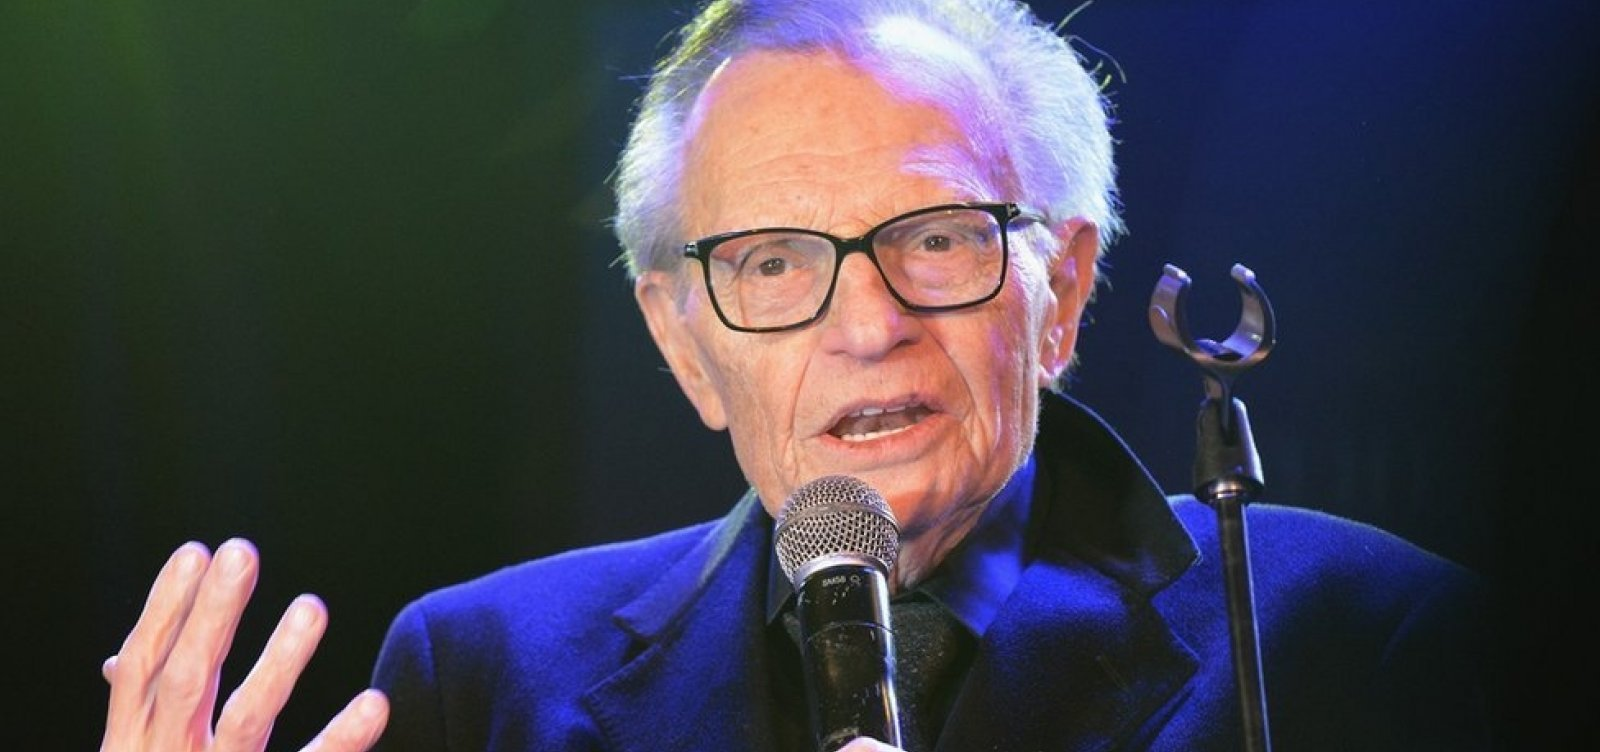 Covid-19: Apresentador Larry King morre aos 87 anos